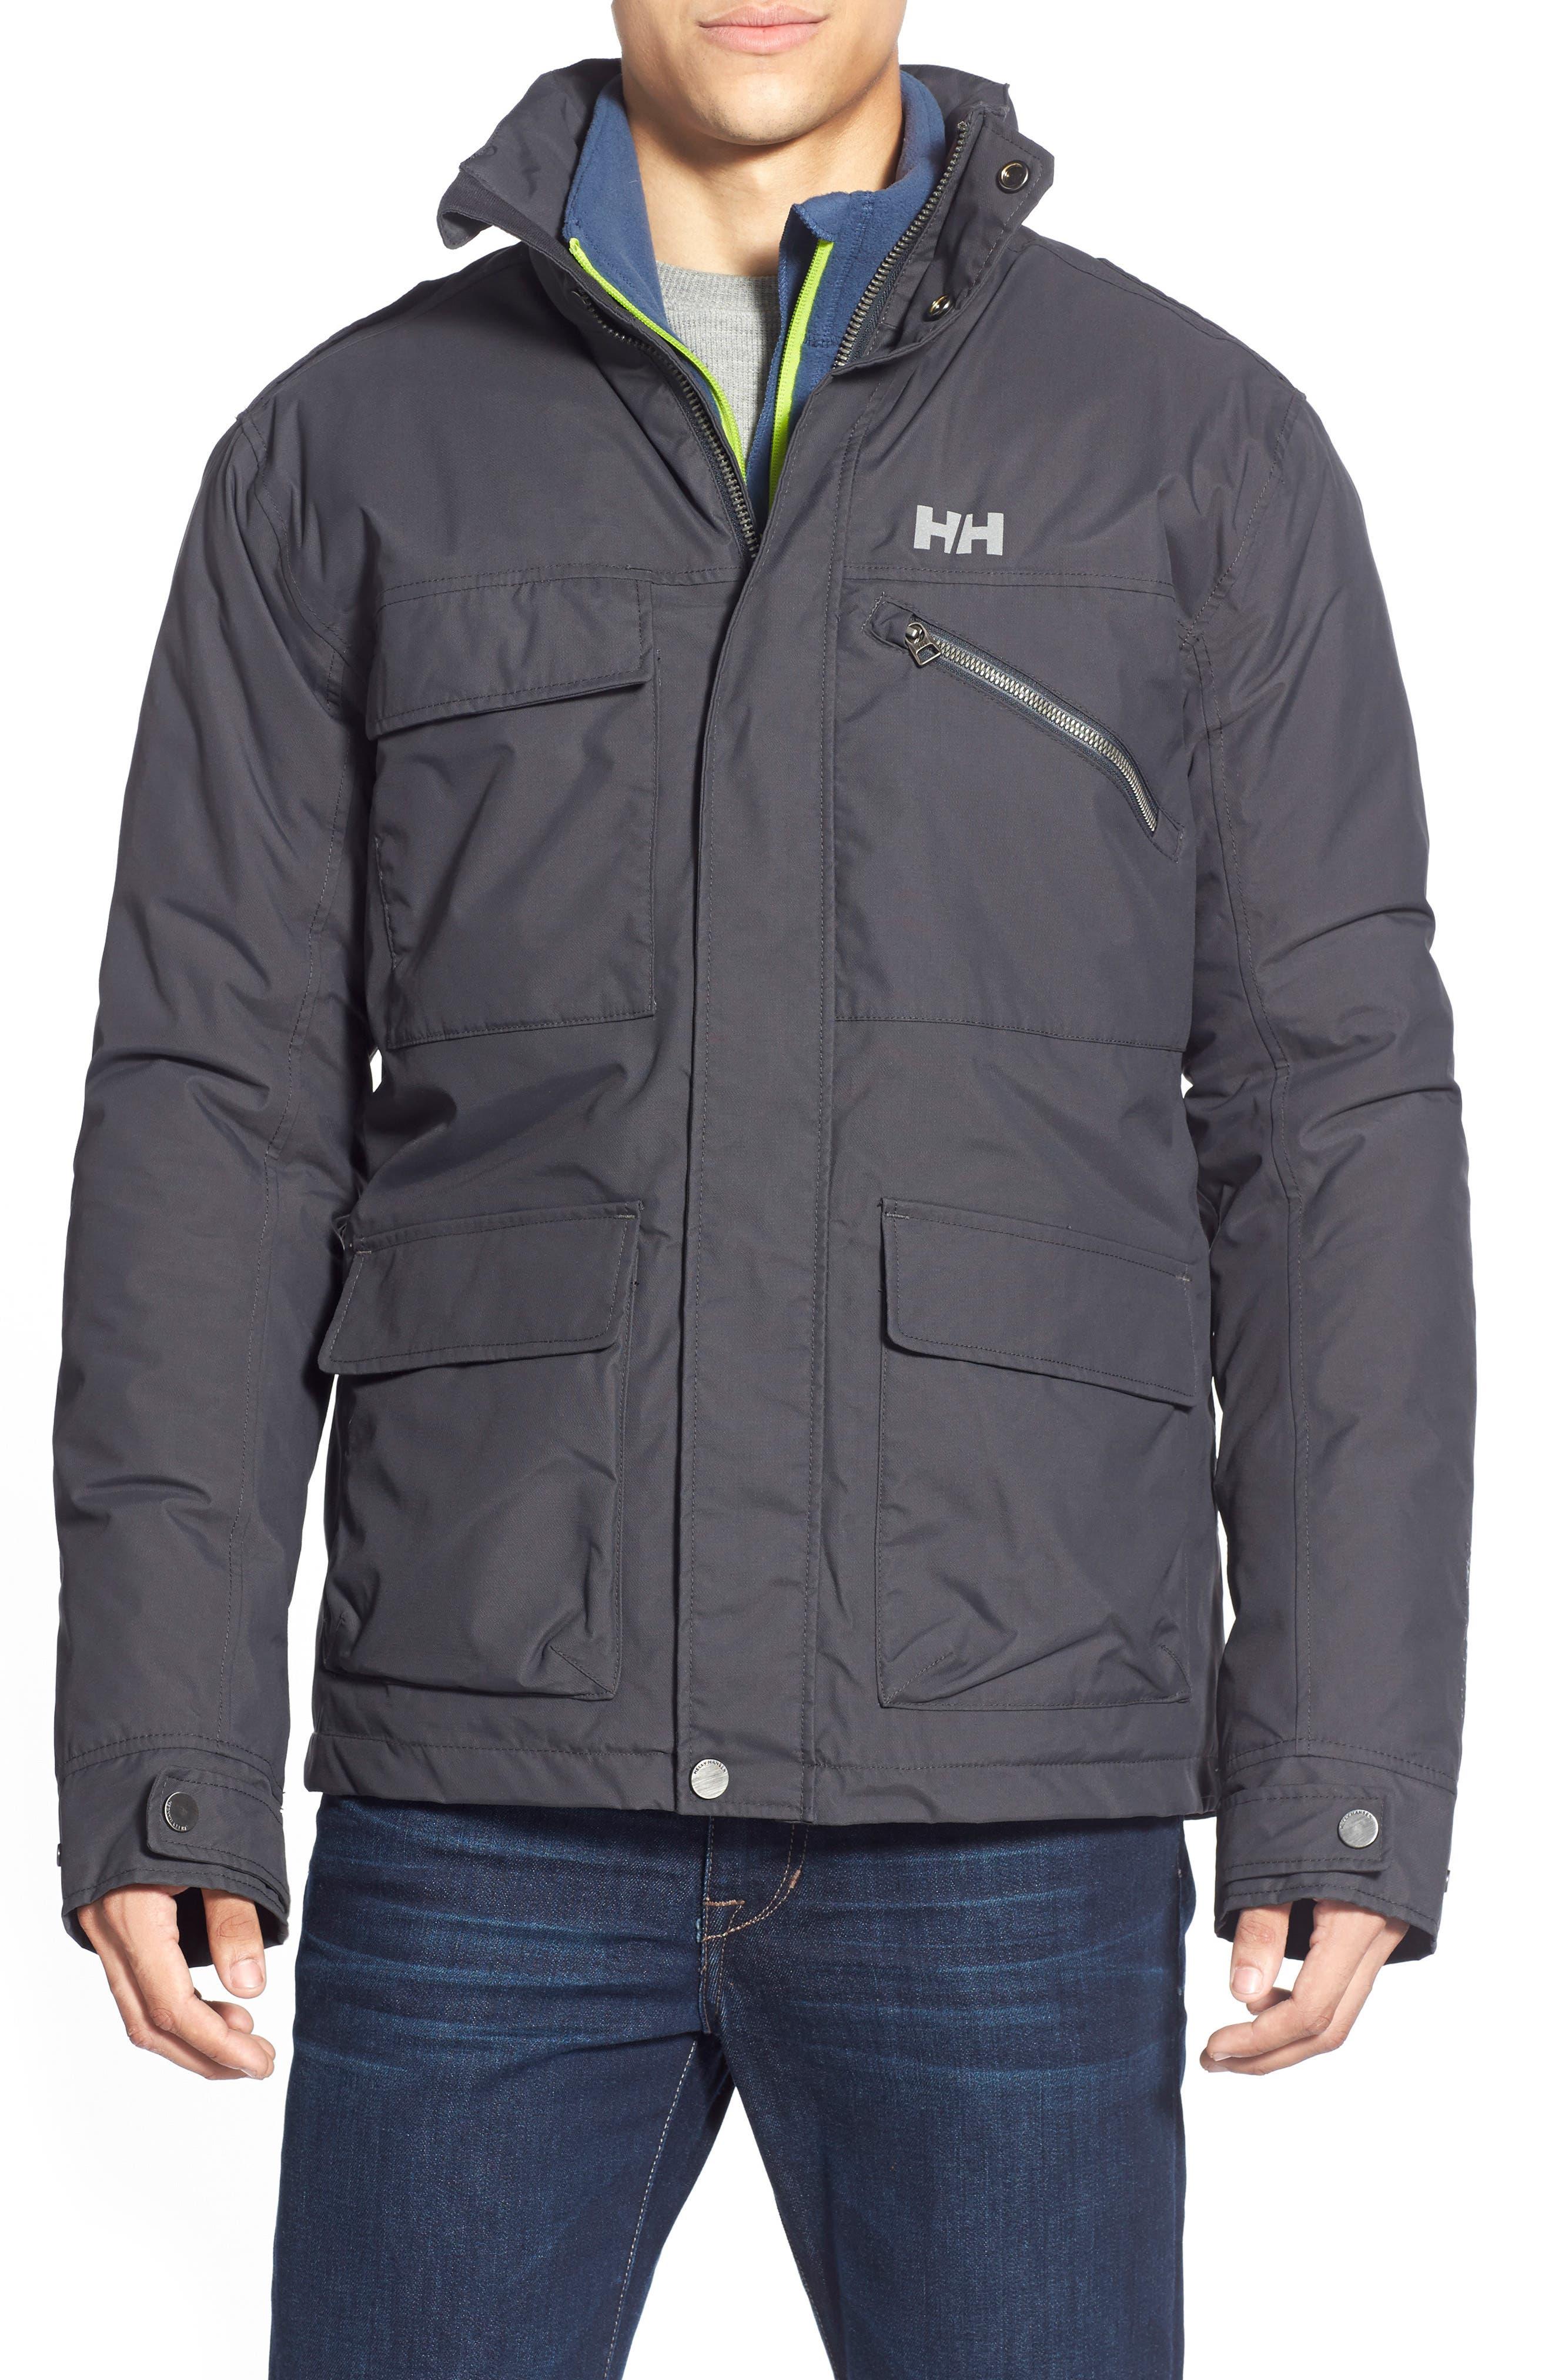 HellyHansen 'Universal' MotoRain Jacket,                             Alternate thumbnail 6, color,                             080